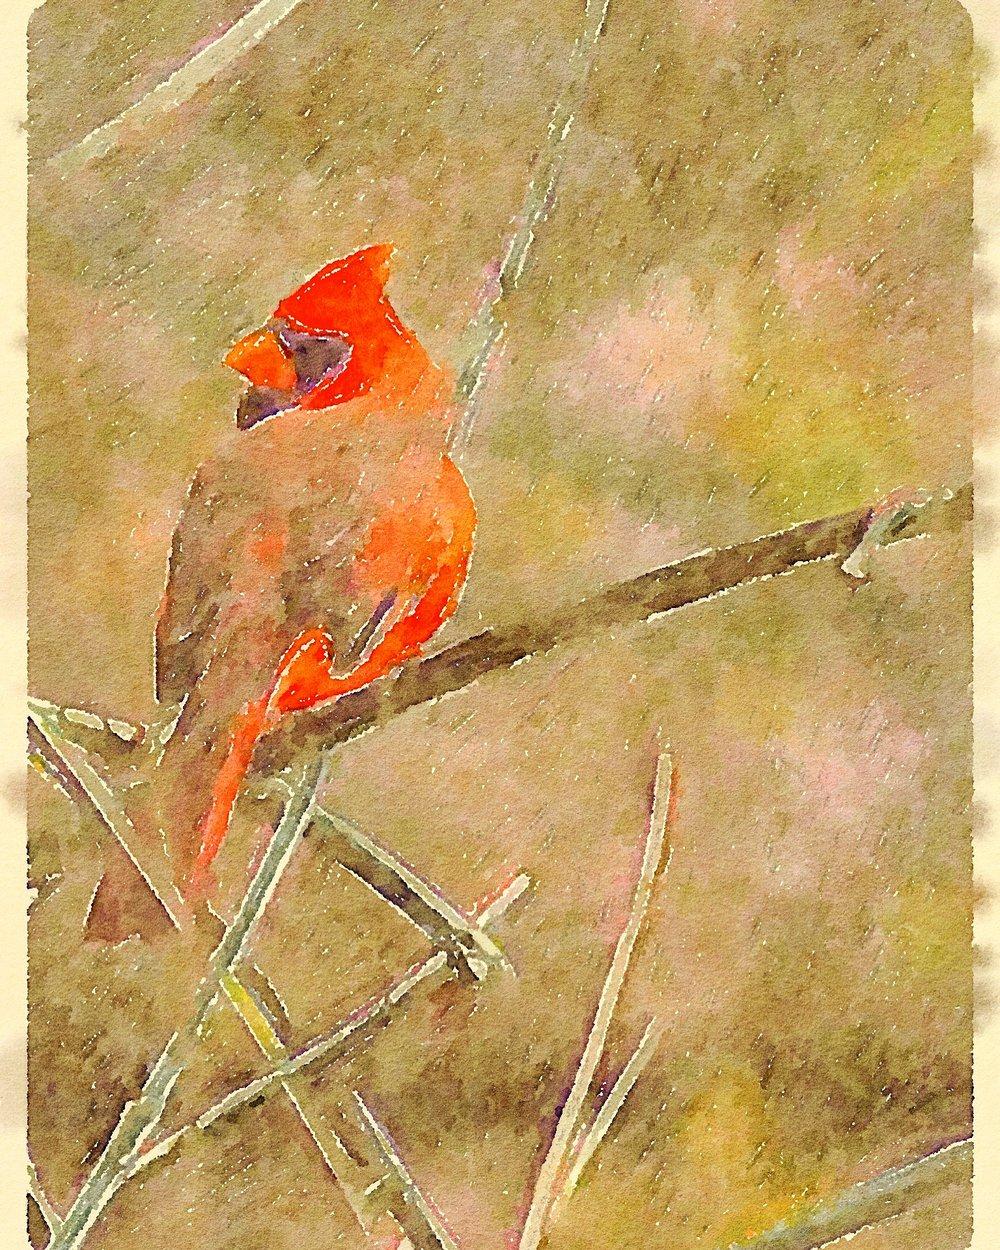 Cardinal at Van Cortlandt Park